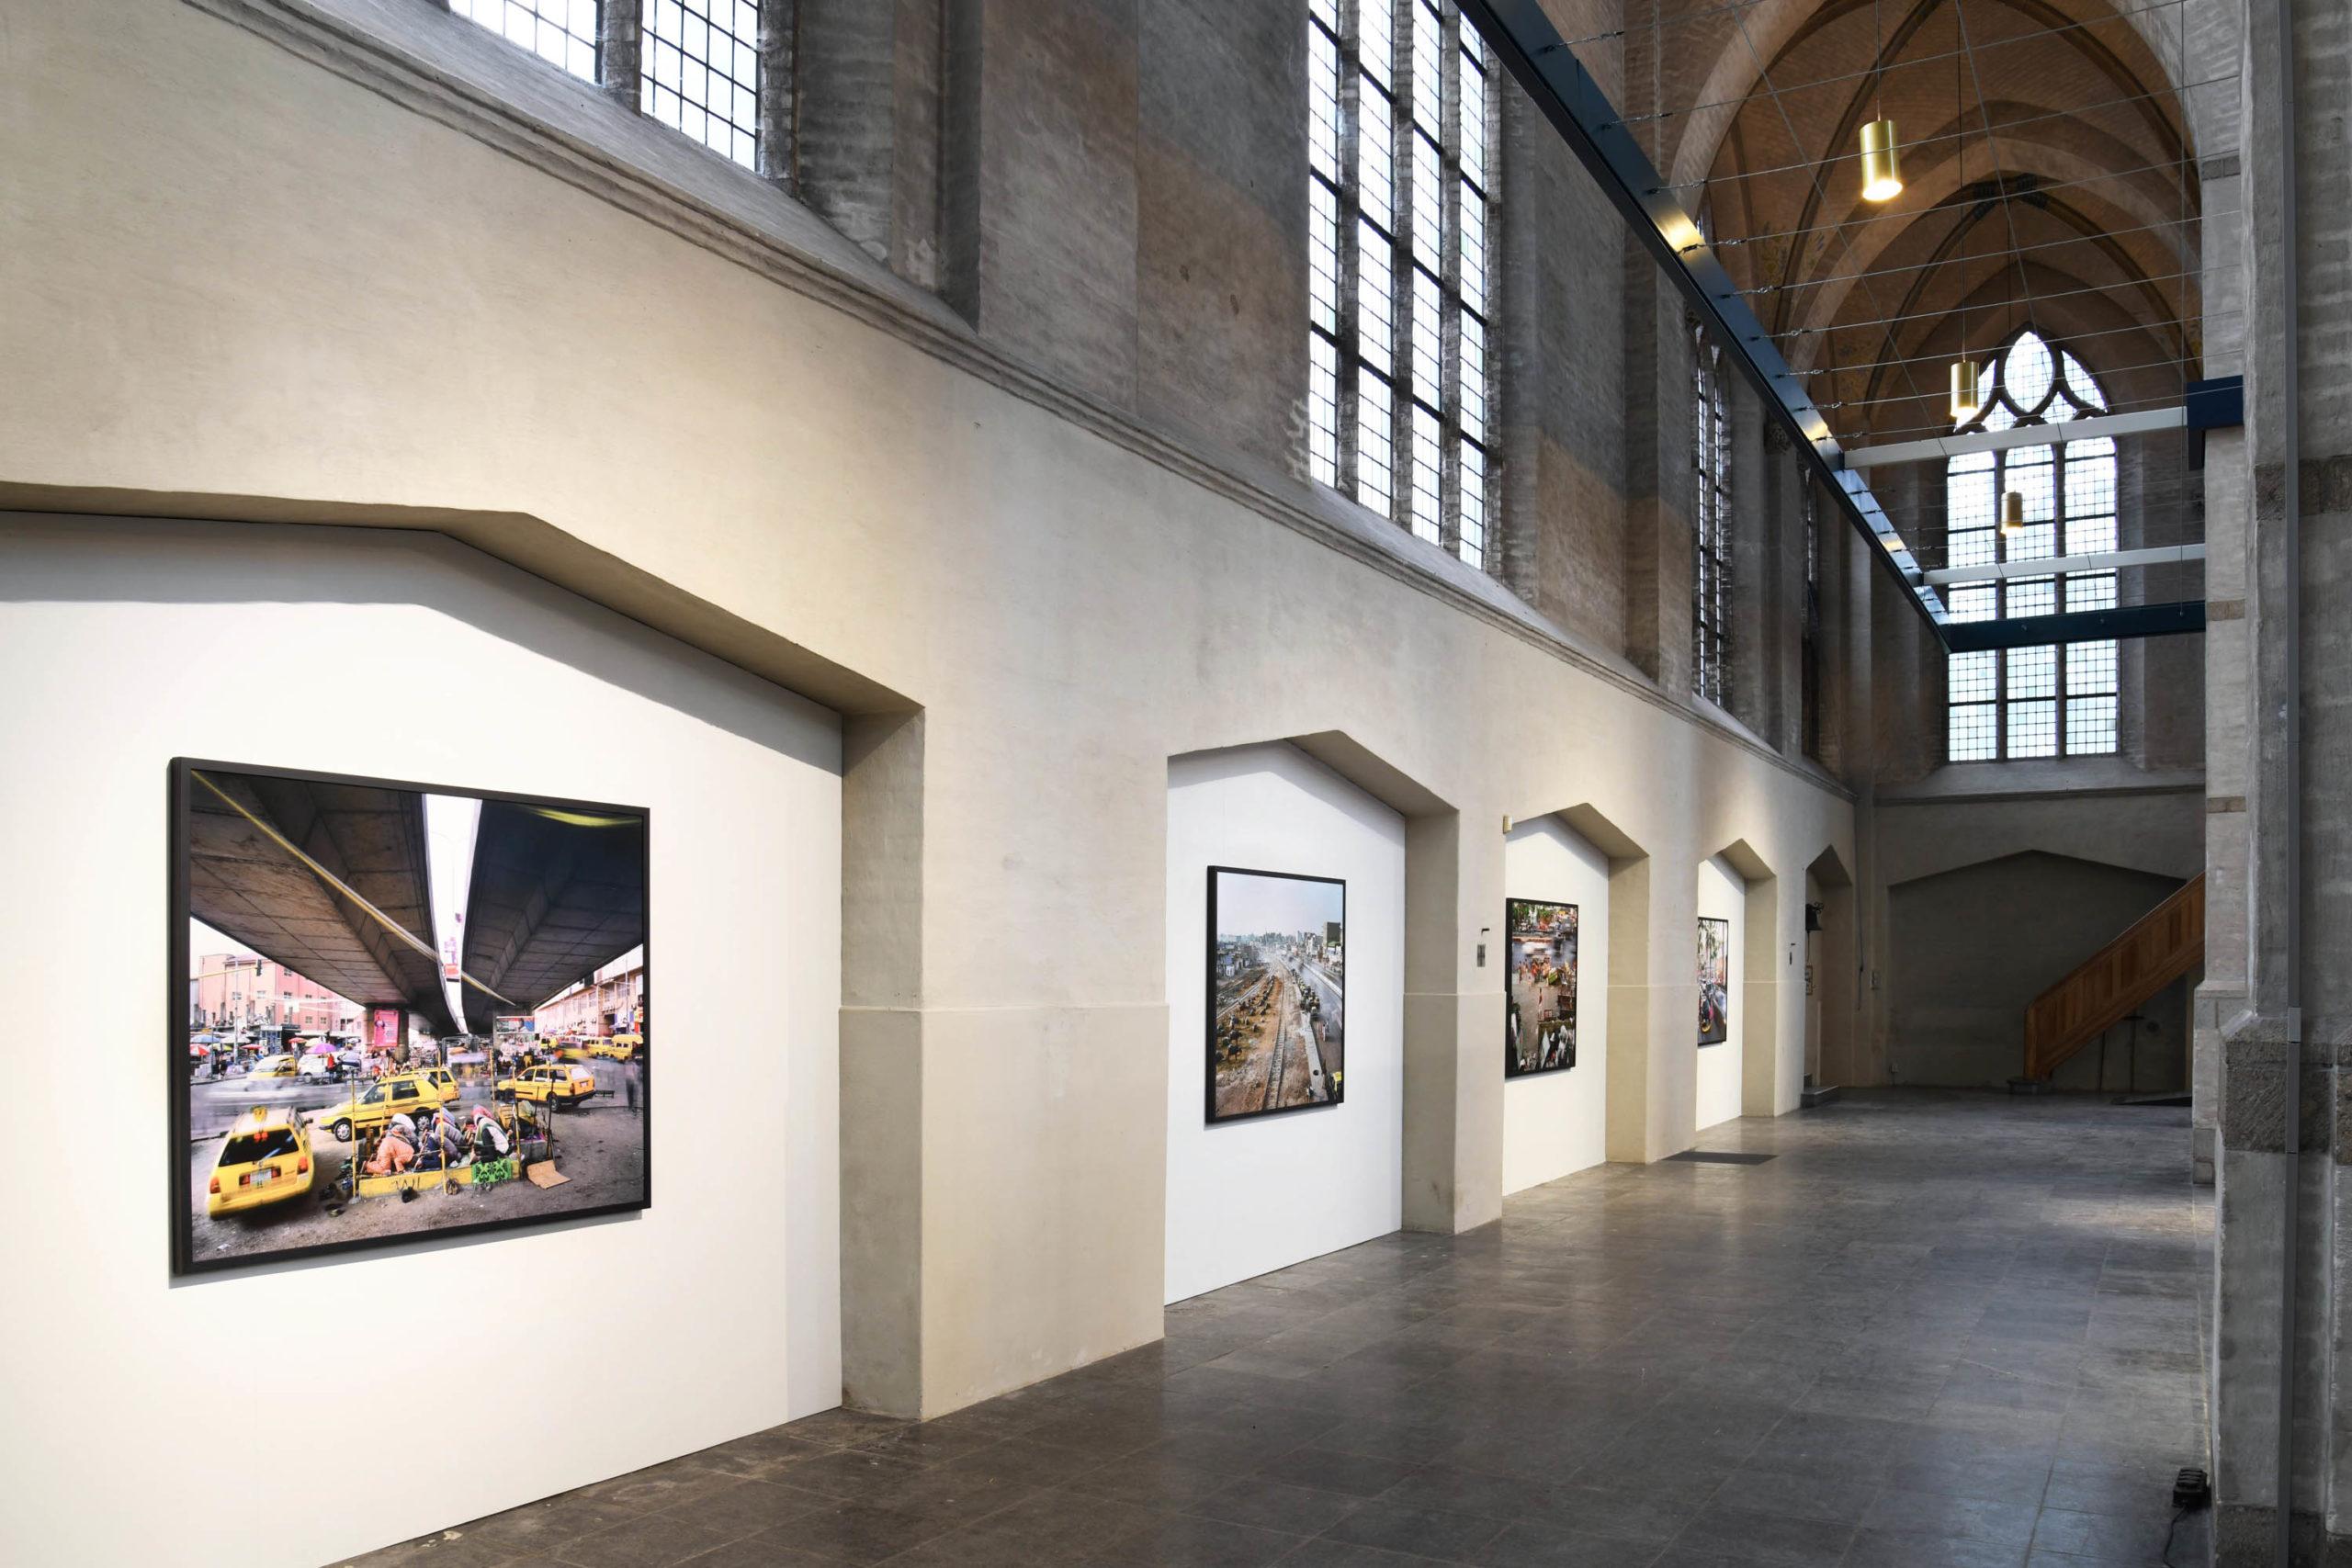 Museum Arnhem (De Kerk), Arnhem, Netherlands